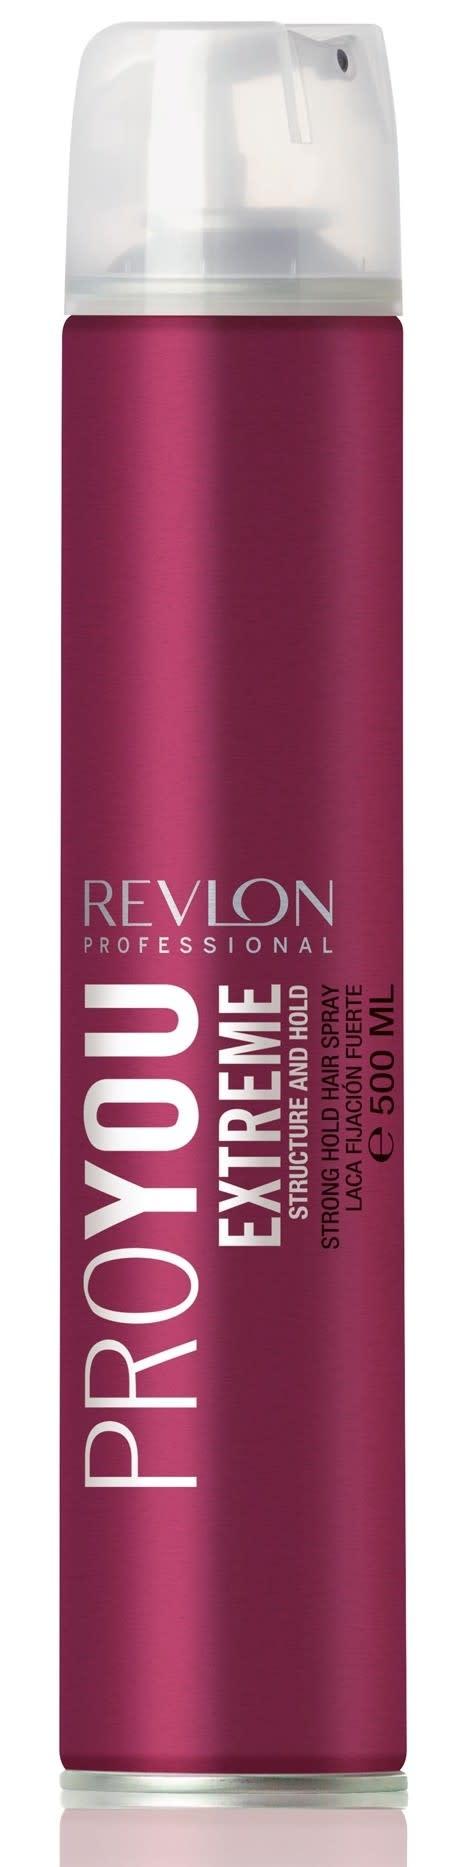 Revlon Proyou Extreme Hair Spray